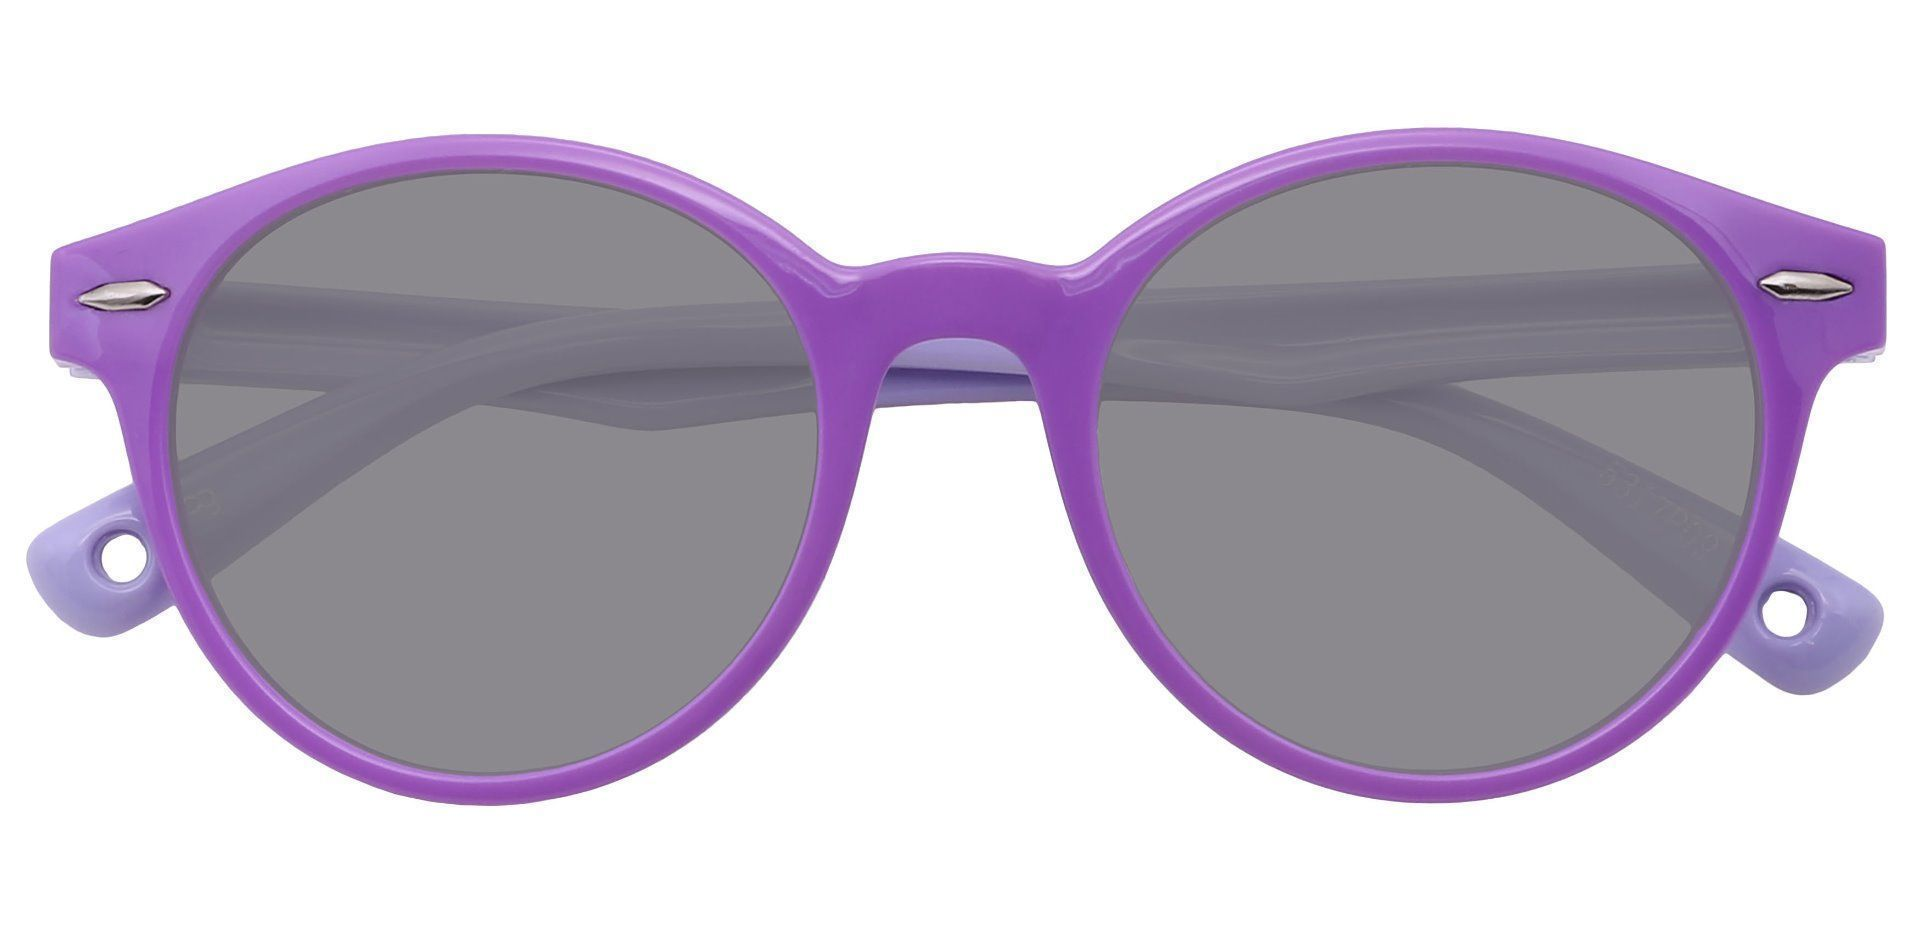 Harris Round Non-Rx Sunglasses - Purple Frame With Gray Lenses